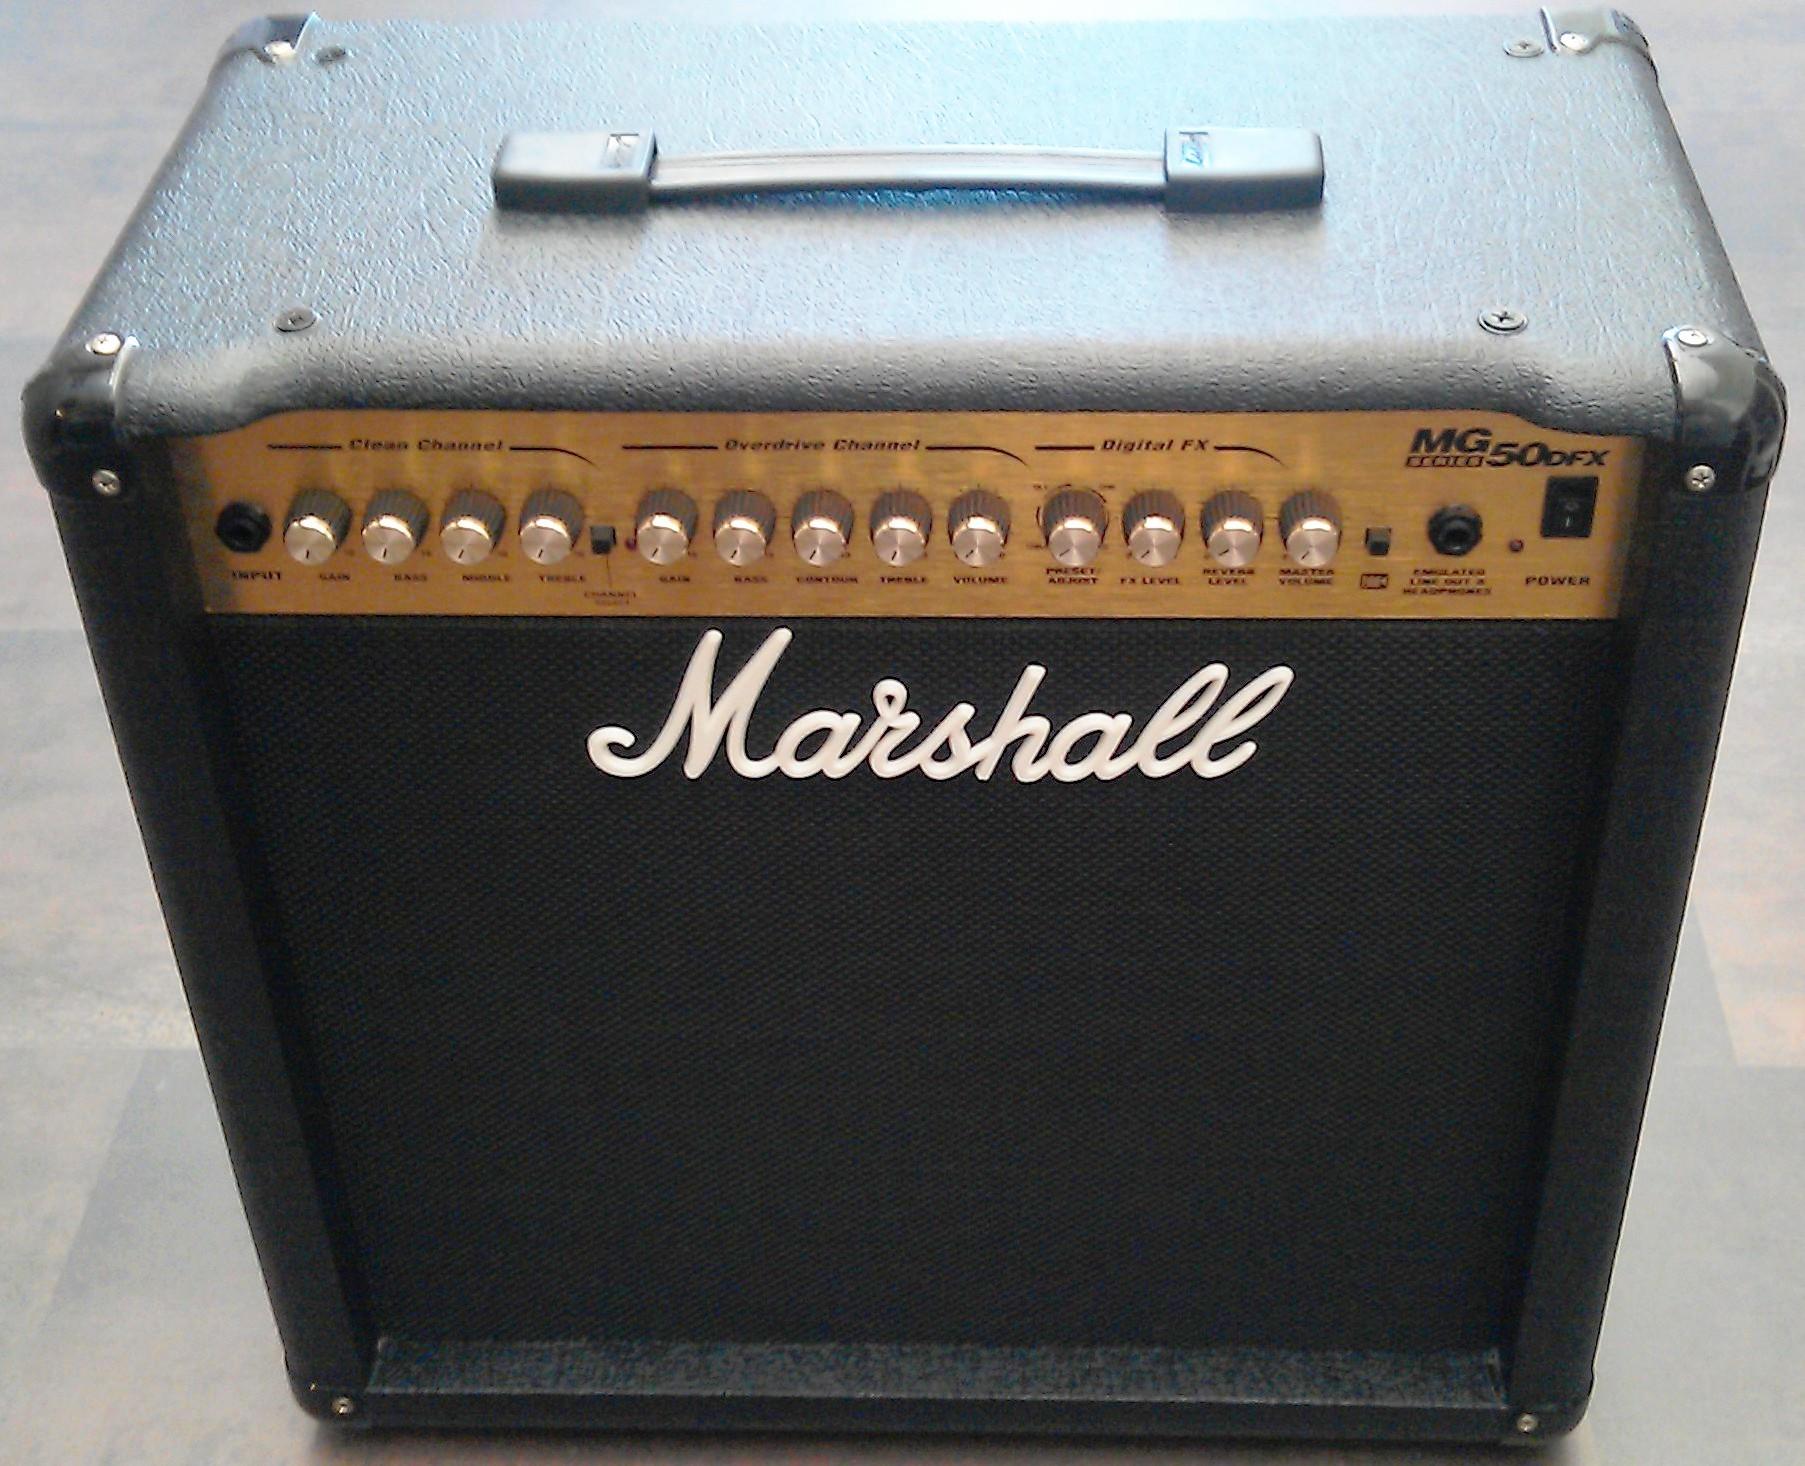 Marshall Mg50dfx Image 340757 Audiofanzine